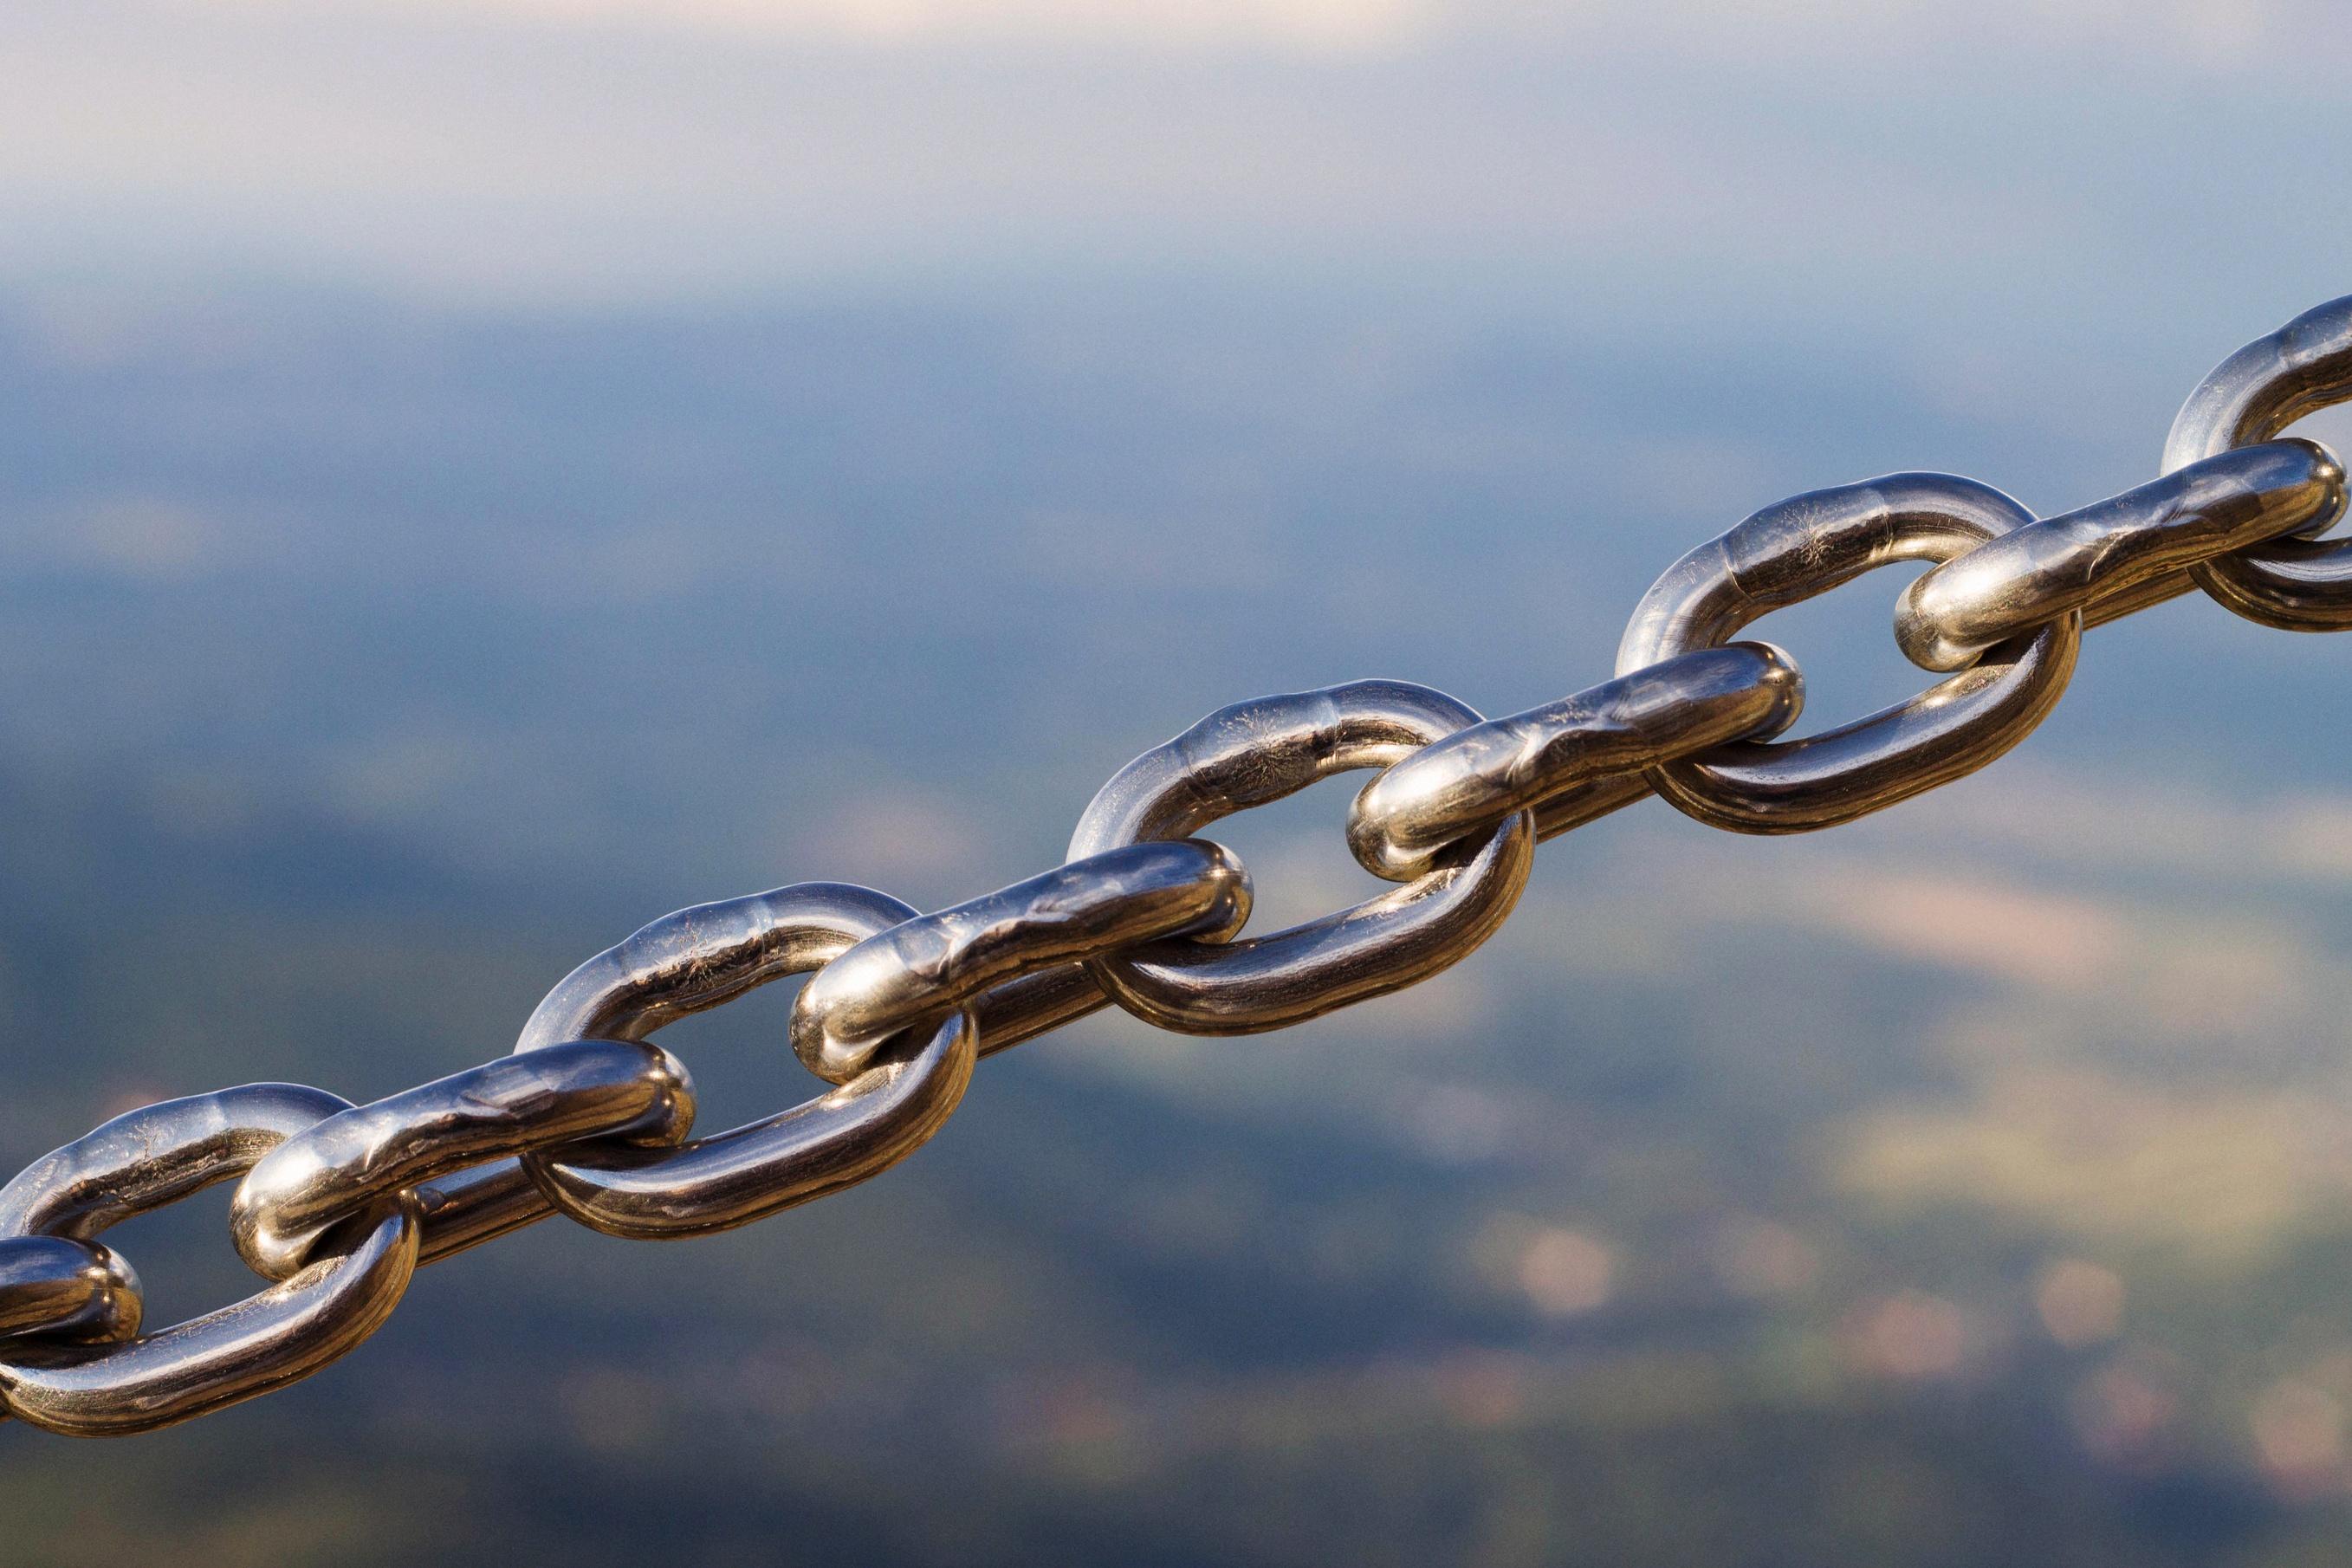 suppy_chain_link_consultation.jpg